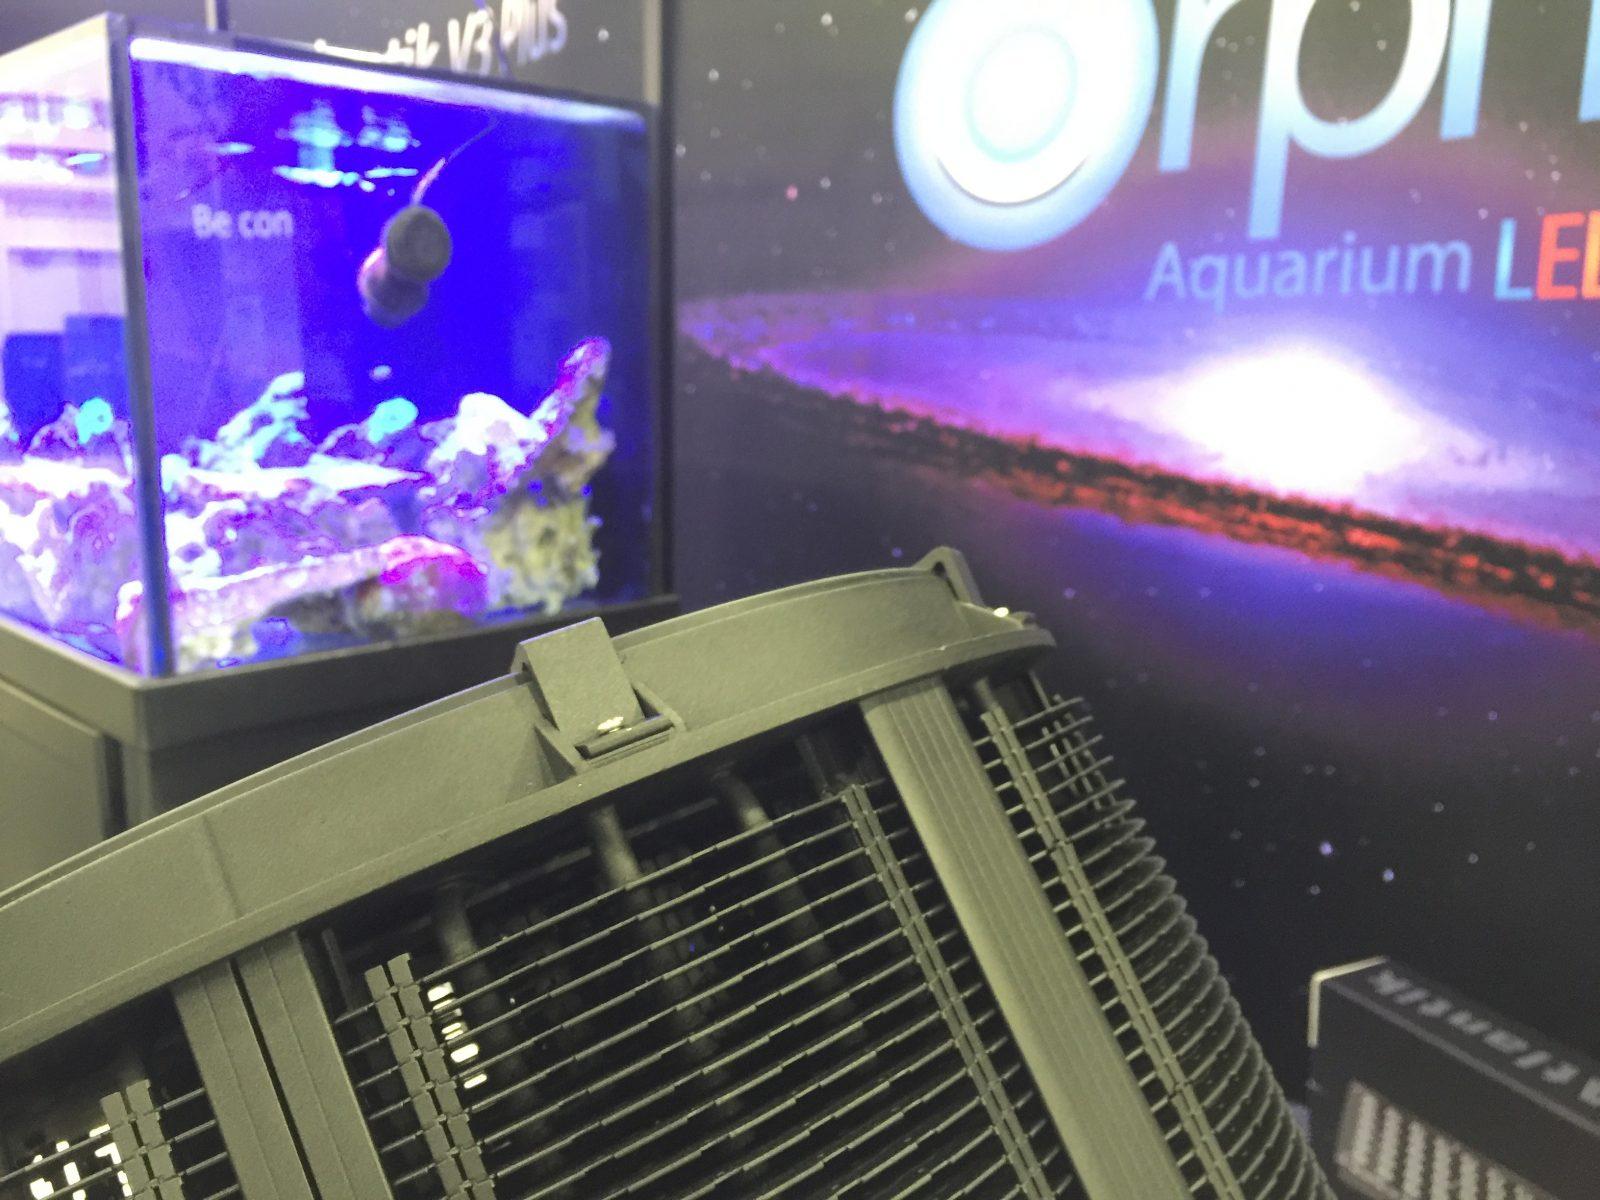 Aquarium-LED-Beleuchtung-Amazonas-500W